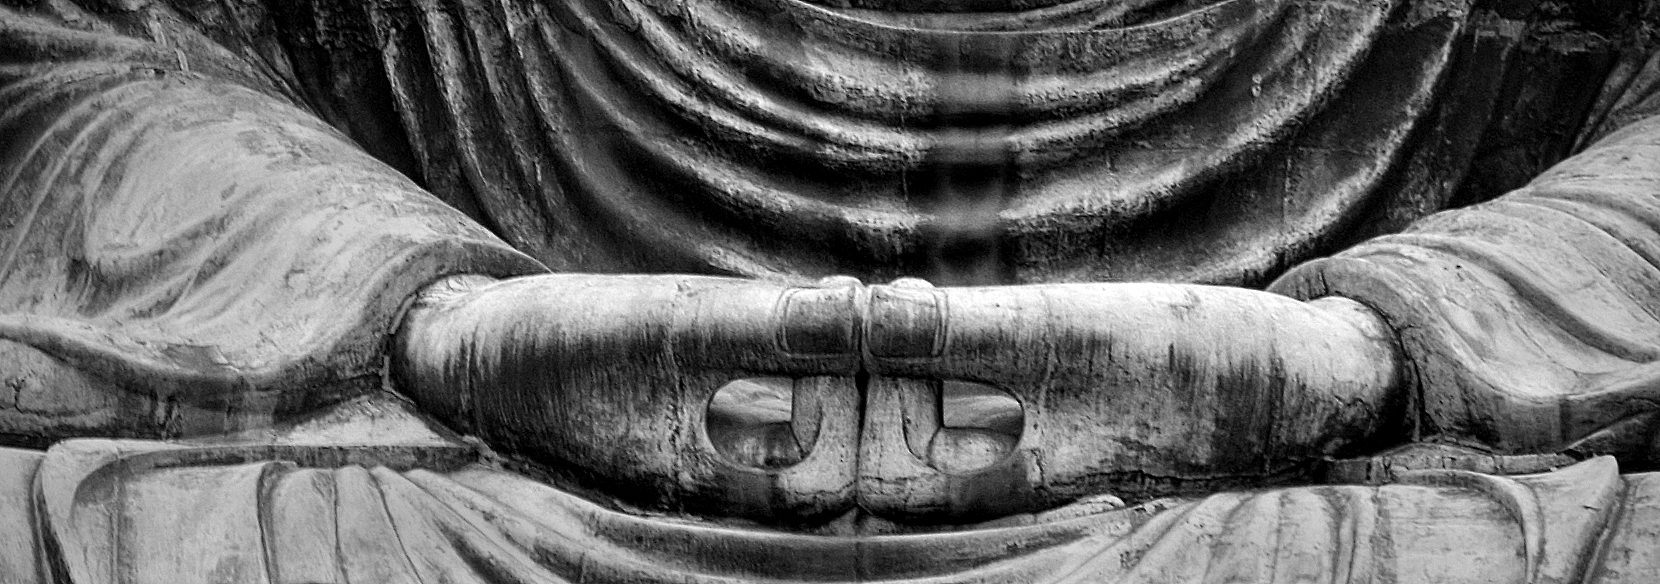 Great Buddah of Kamakura, Kotoku-in Temple, Leica M8 90mm Elmarit-M